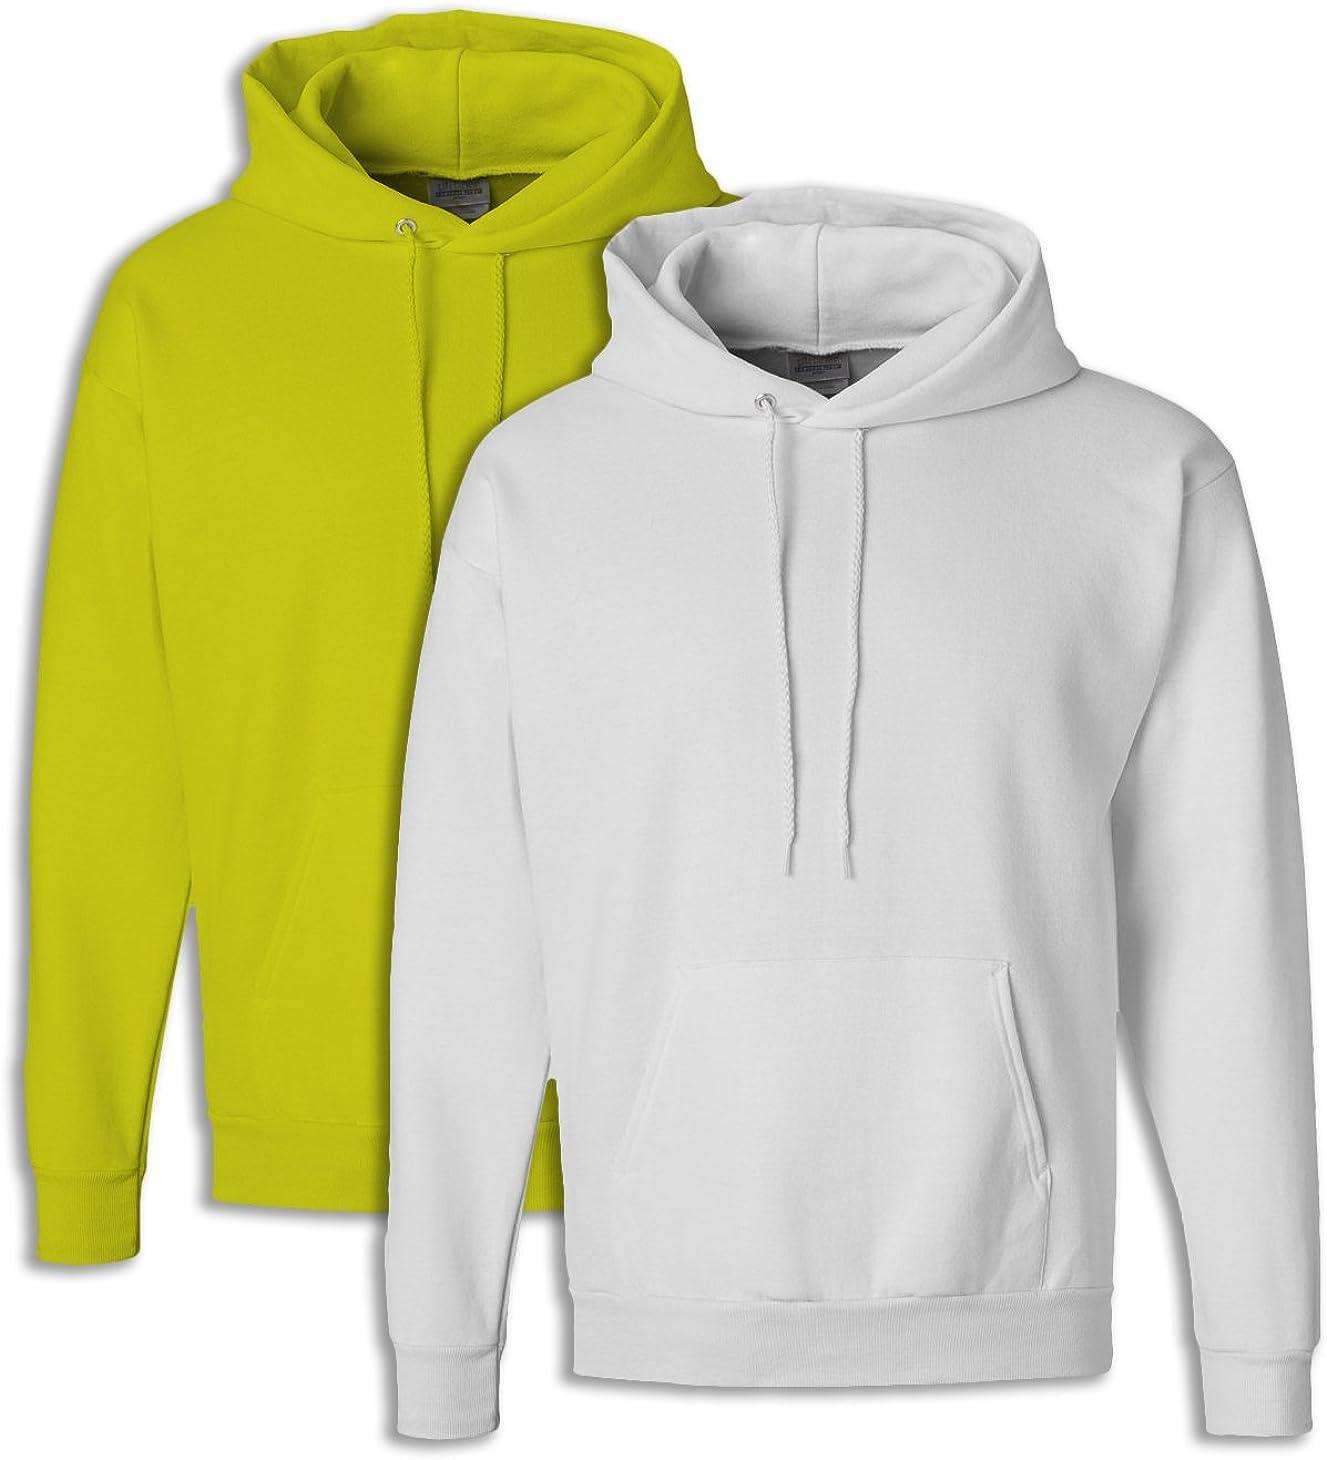 Hanes Mens EcoSmart Hooded Sweatshirt XL 1 Safety Green 1 White